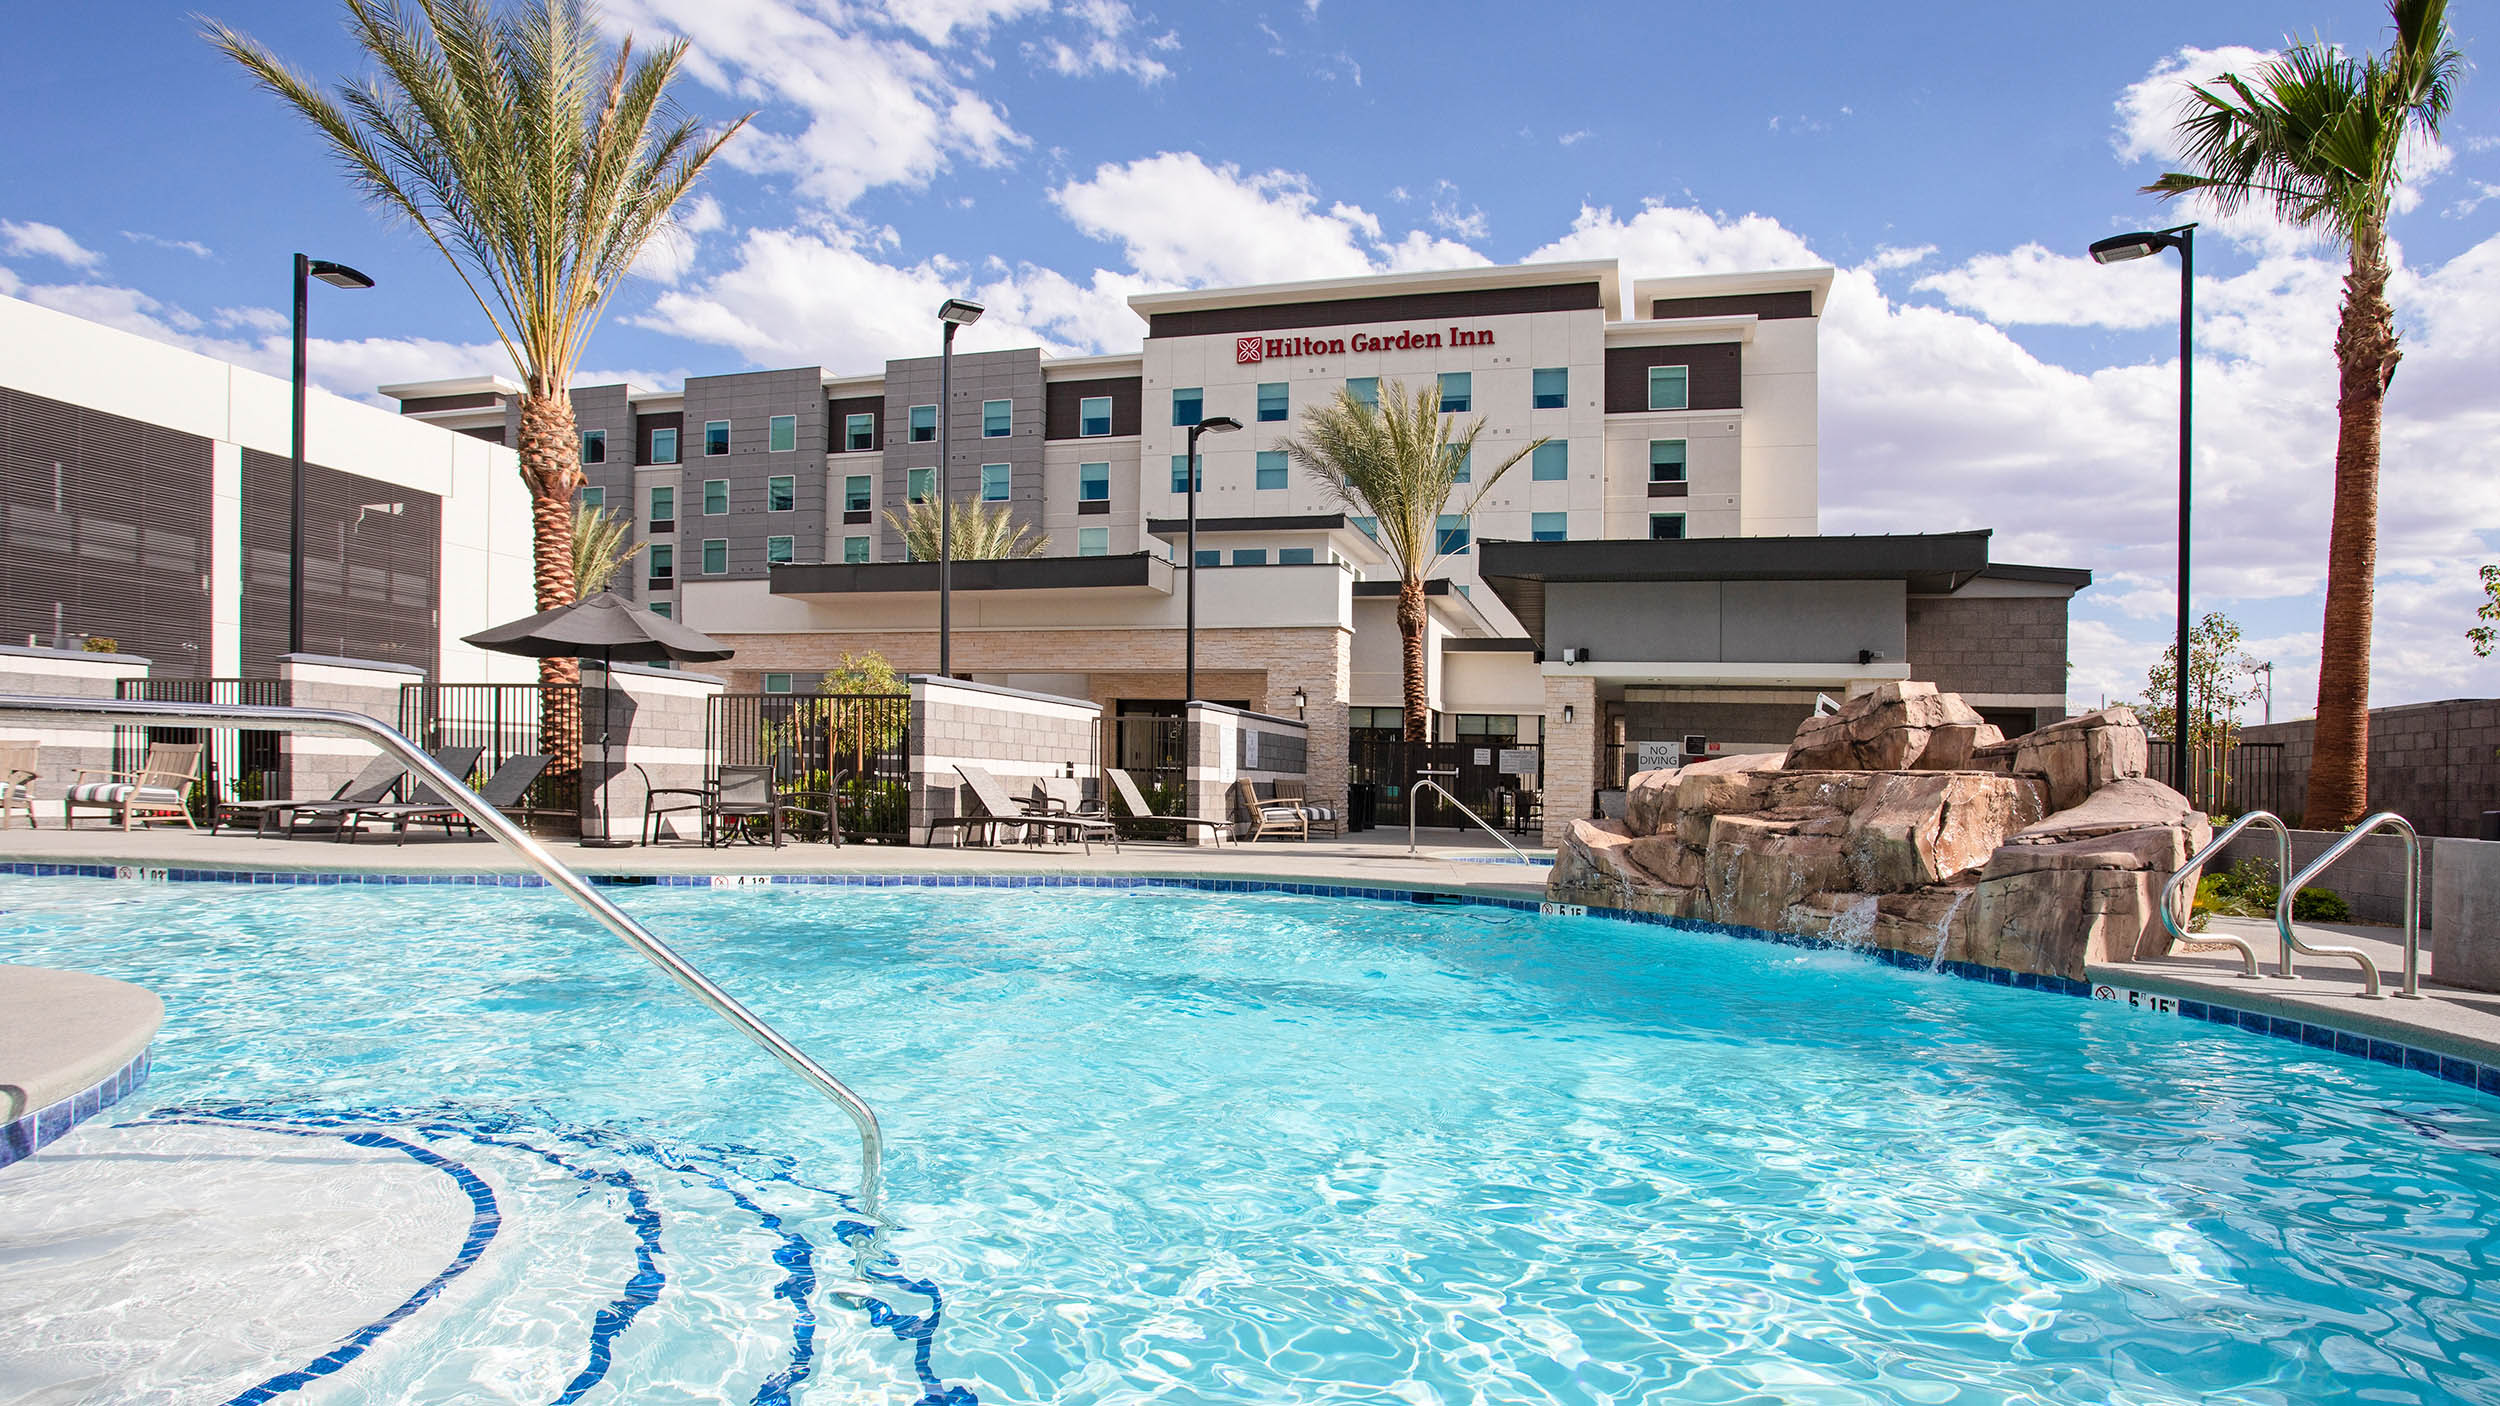 LASLGGI Hilton Garden Inn Las Vegas Pool 2500.jpg